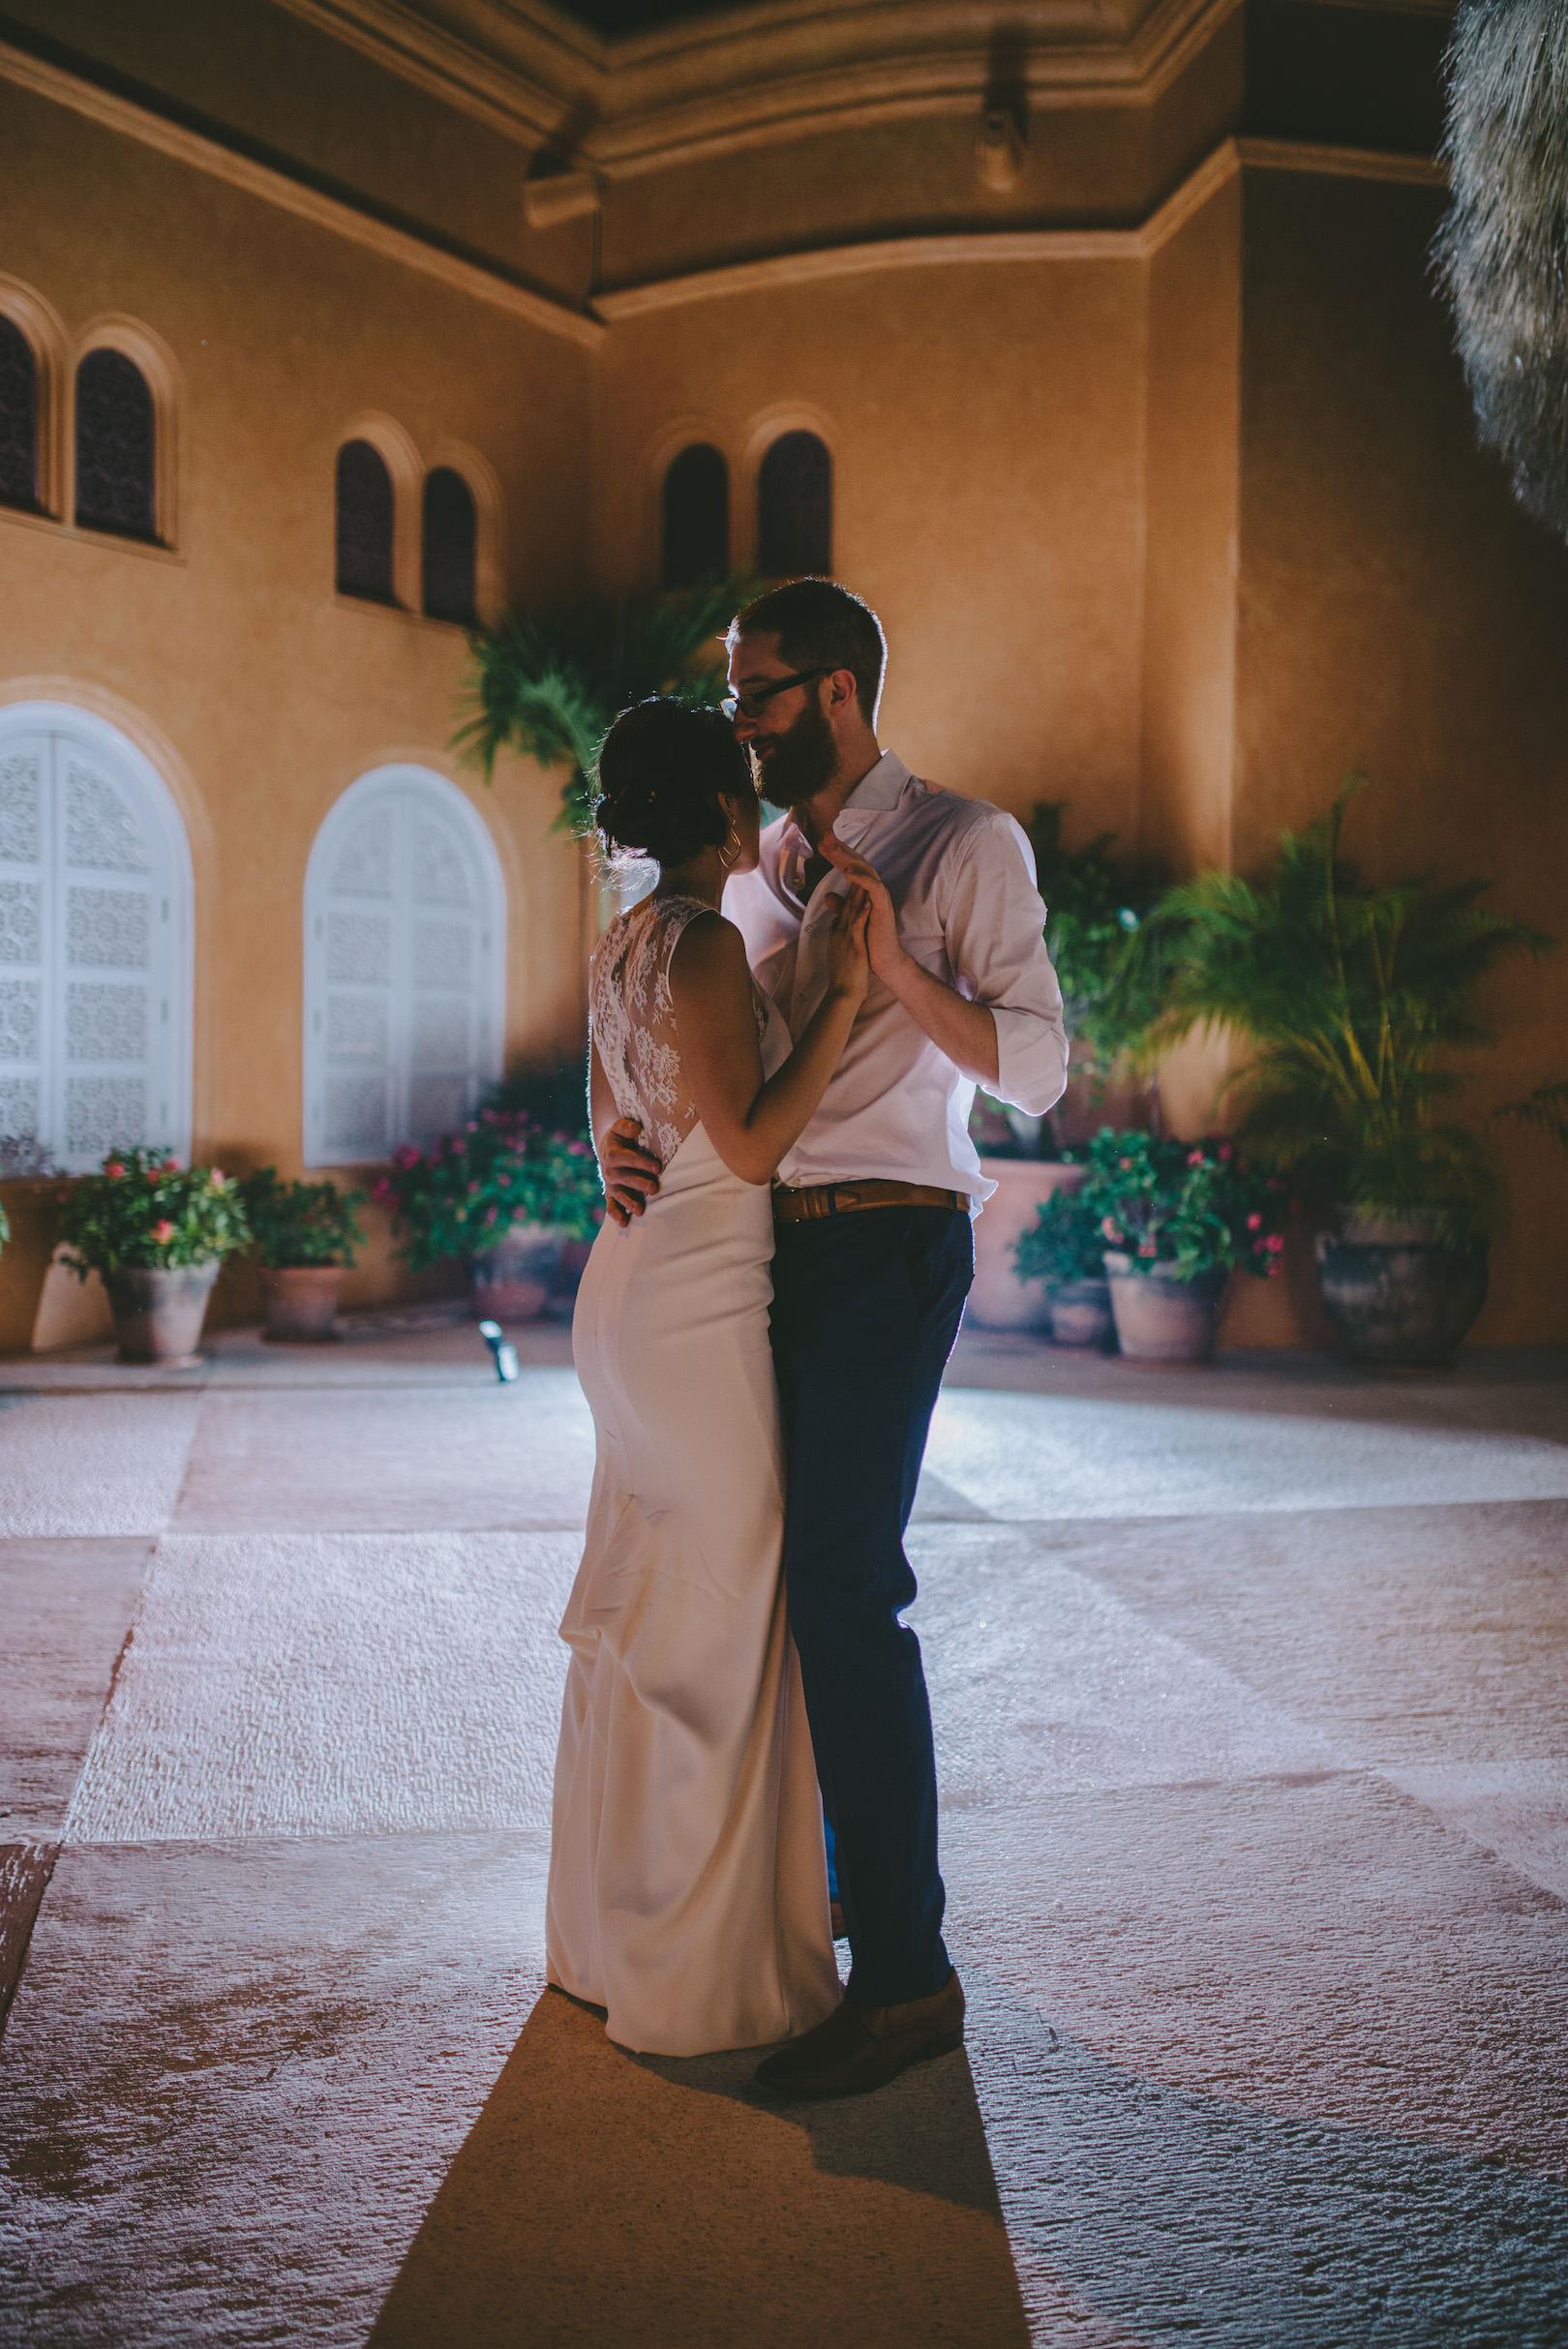 Nathan & Felicia - Wedding Day - © Dallas Kolotylo Photography - 684